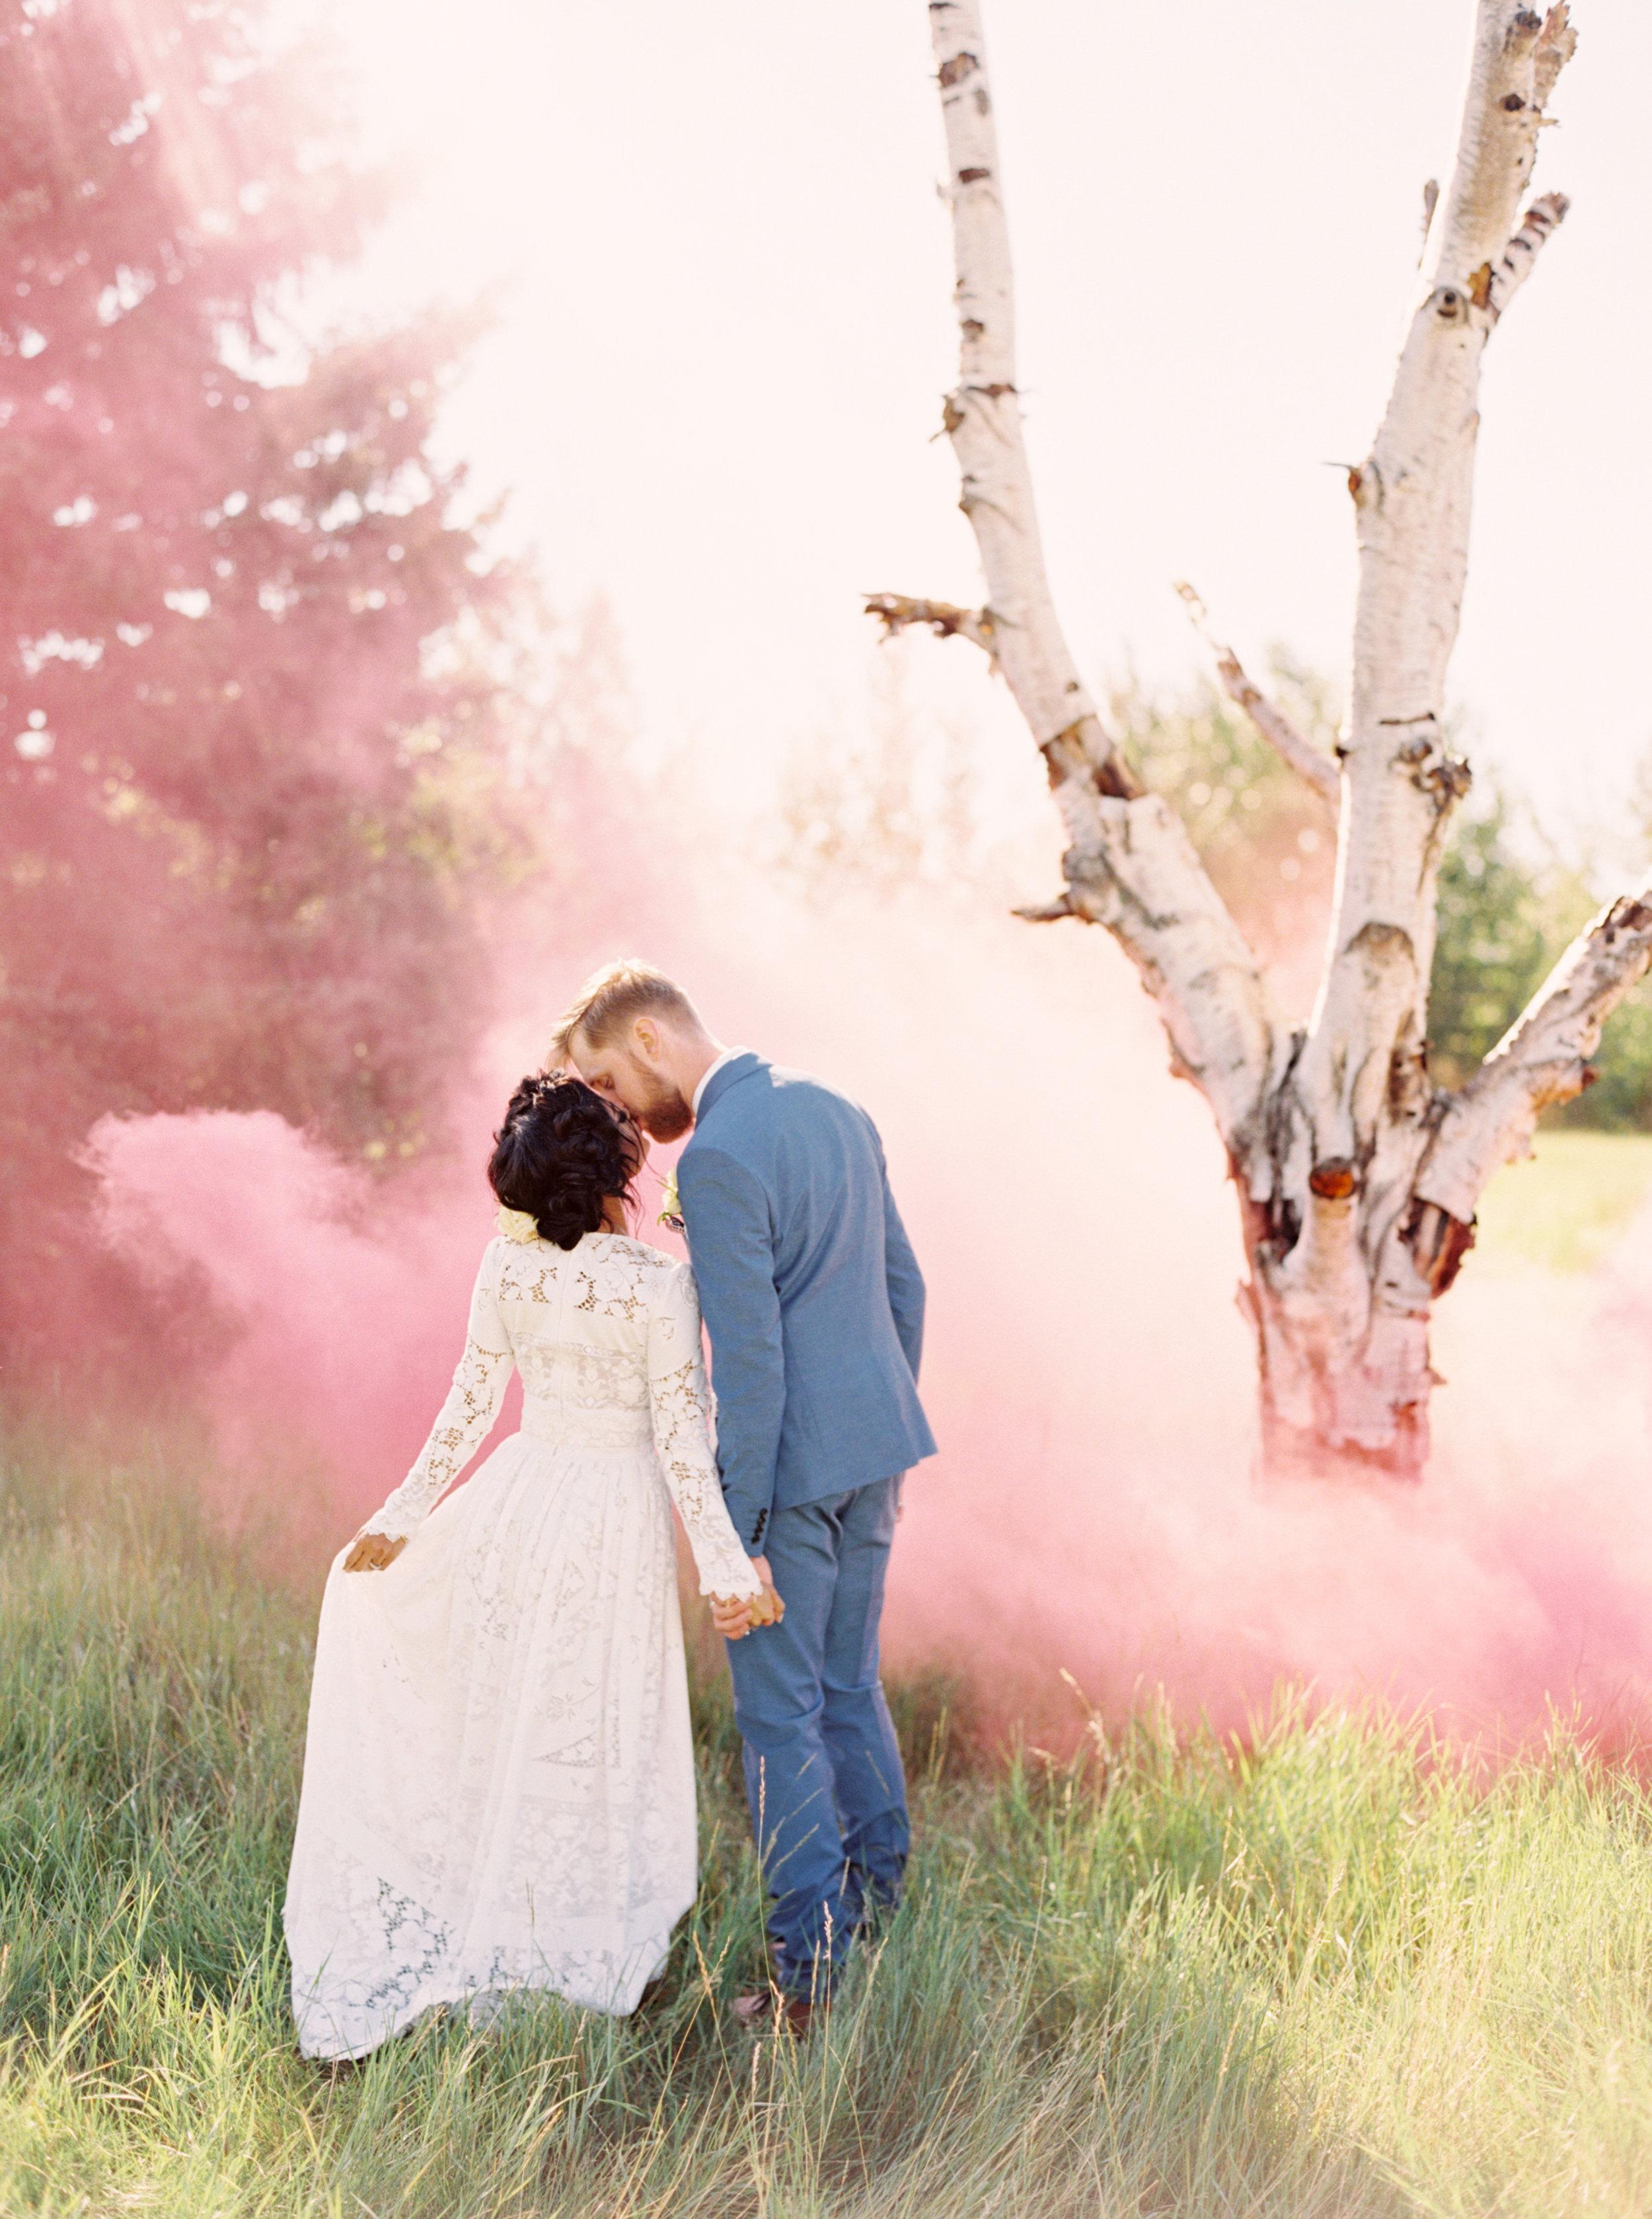 calgary wedding photographers   Smoke bomb wedding photo   fine art film photographers